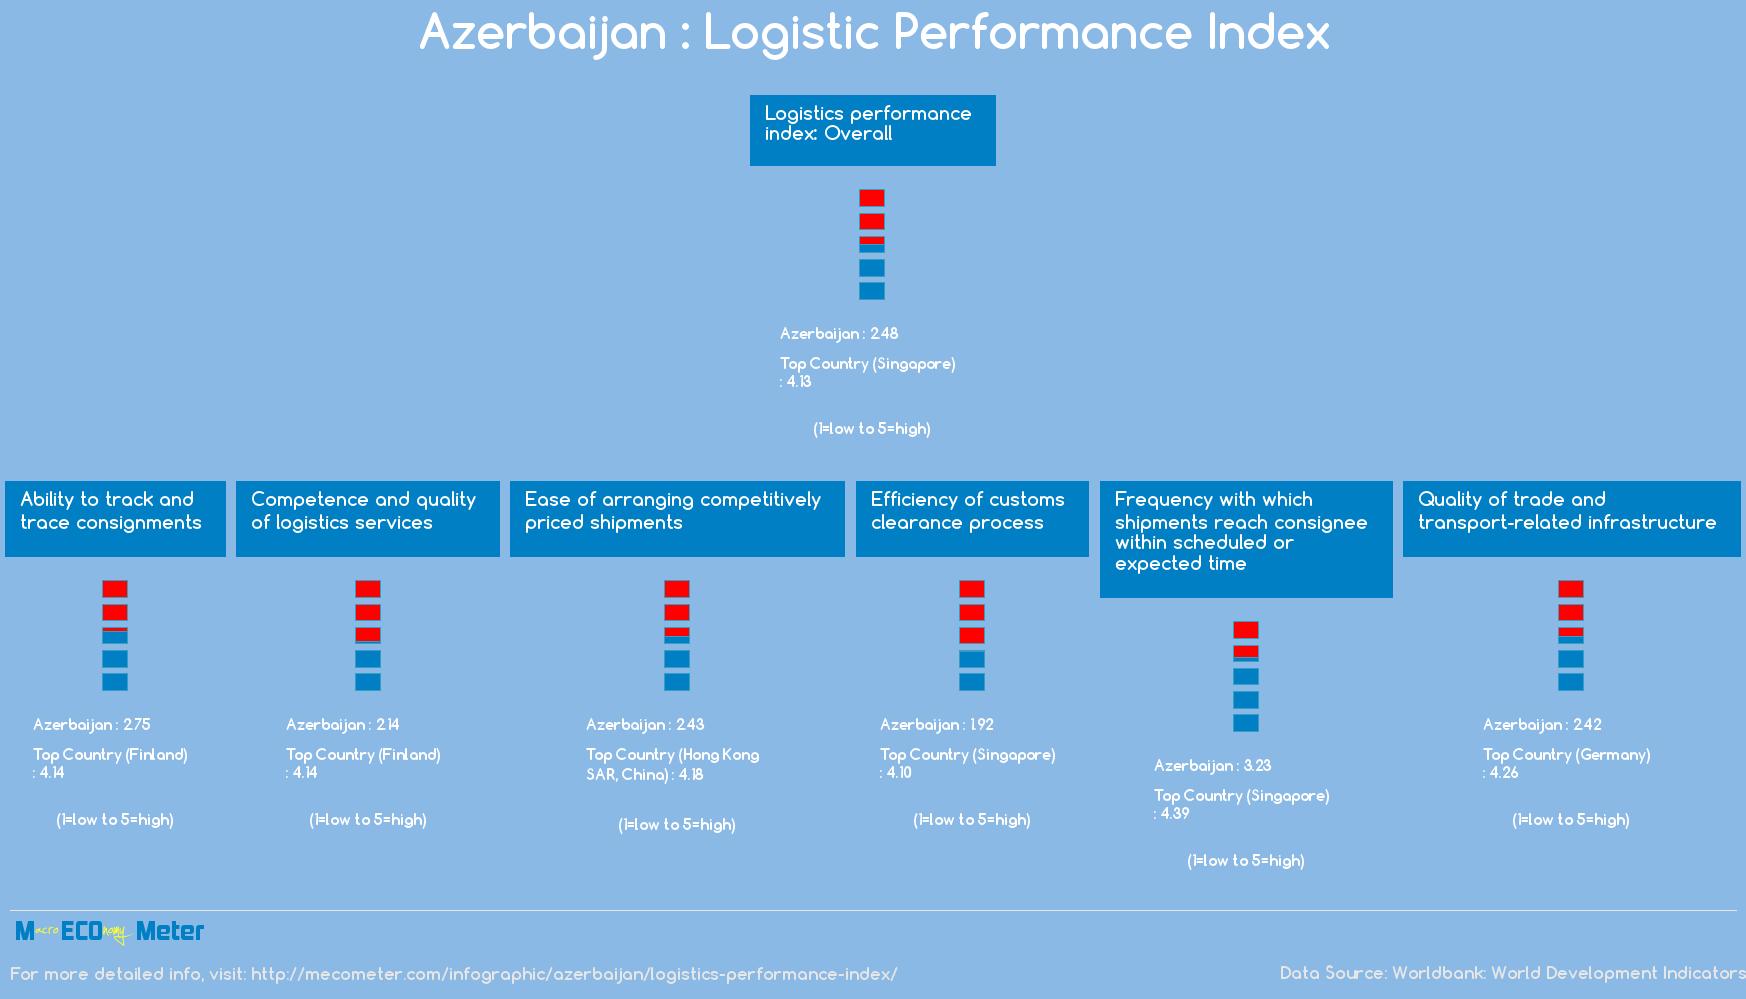 Azerbaijan : Logistic Performance Index